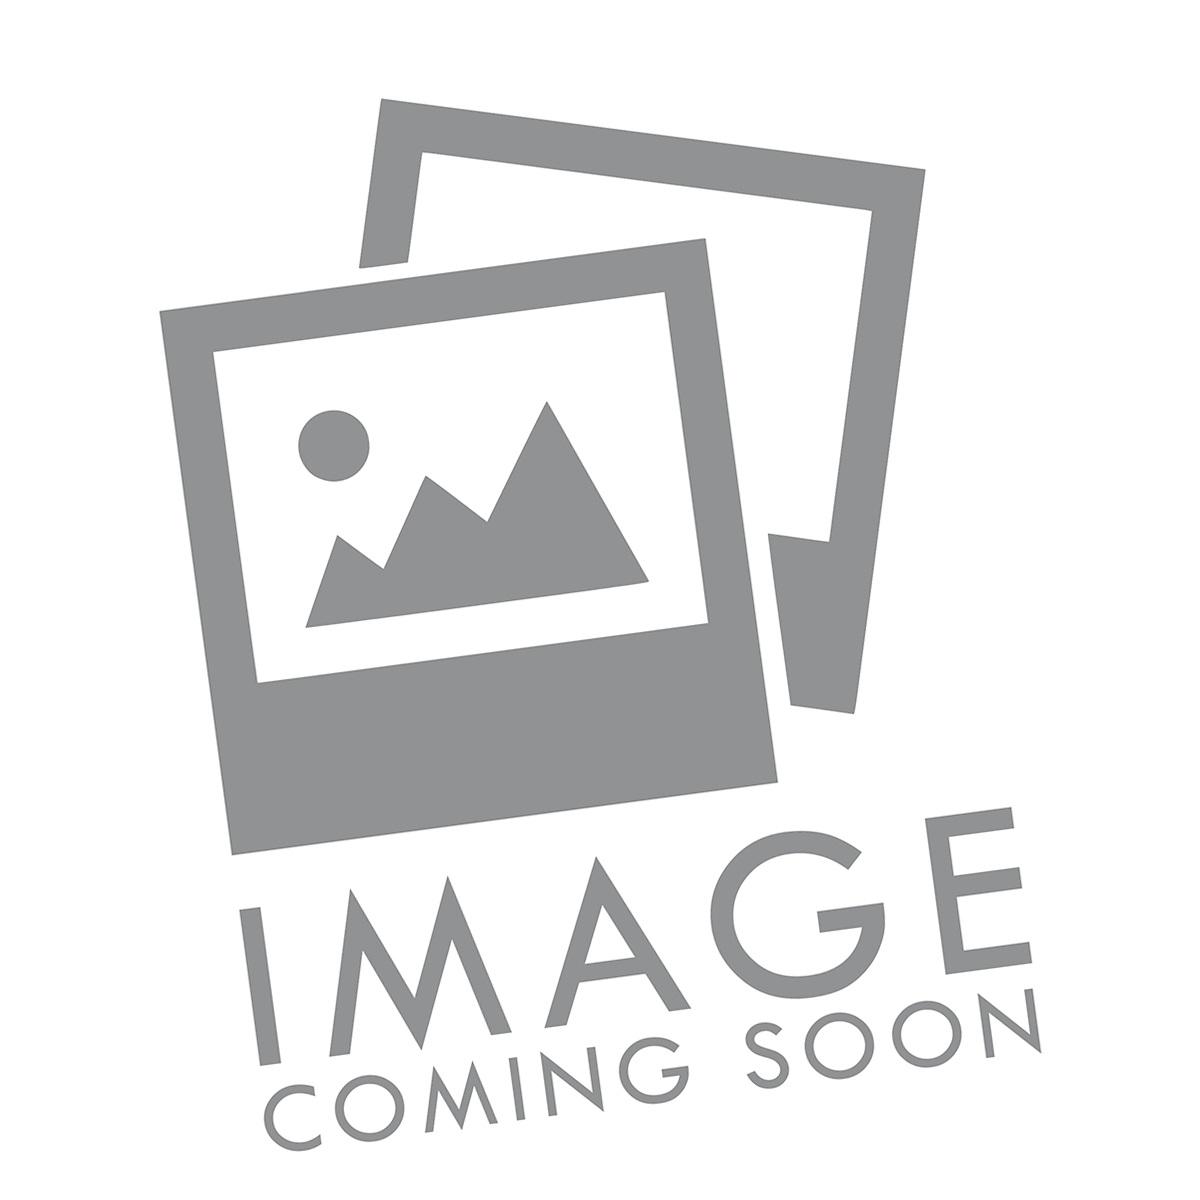 Businessfotografie - image coming soon